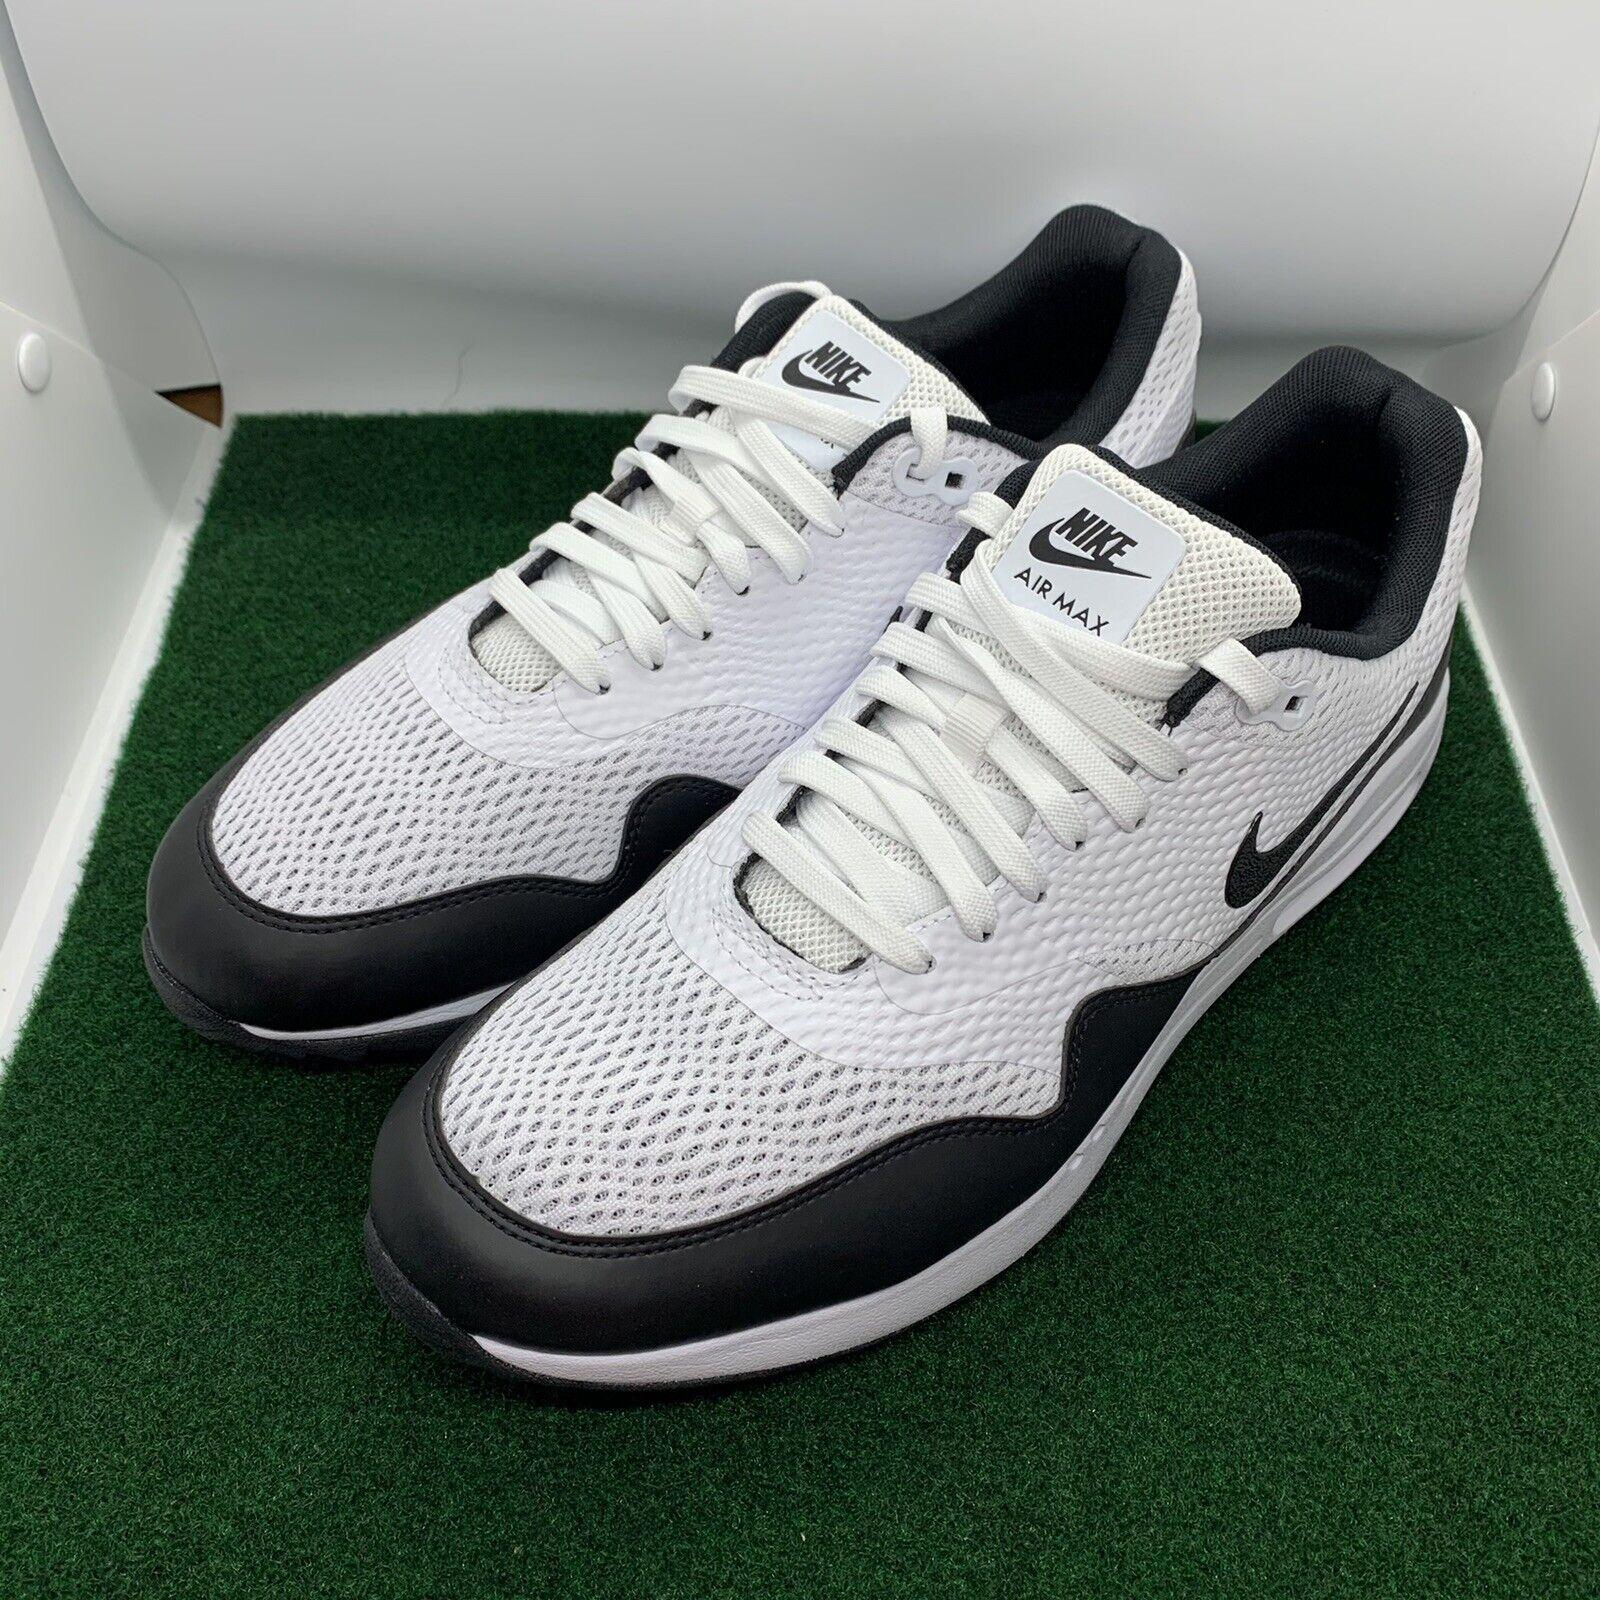 Size 14 - Nike Air Max 1 Golf White Black for sale online   eBay